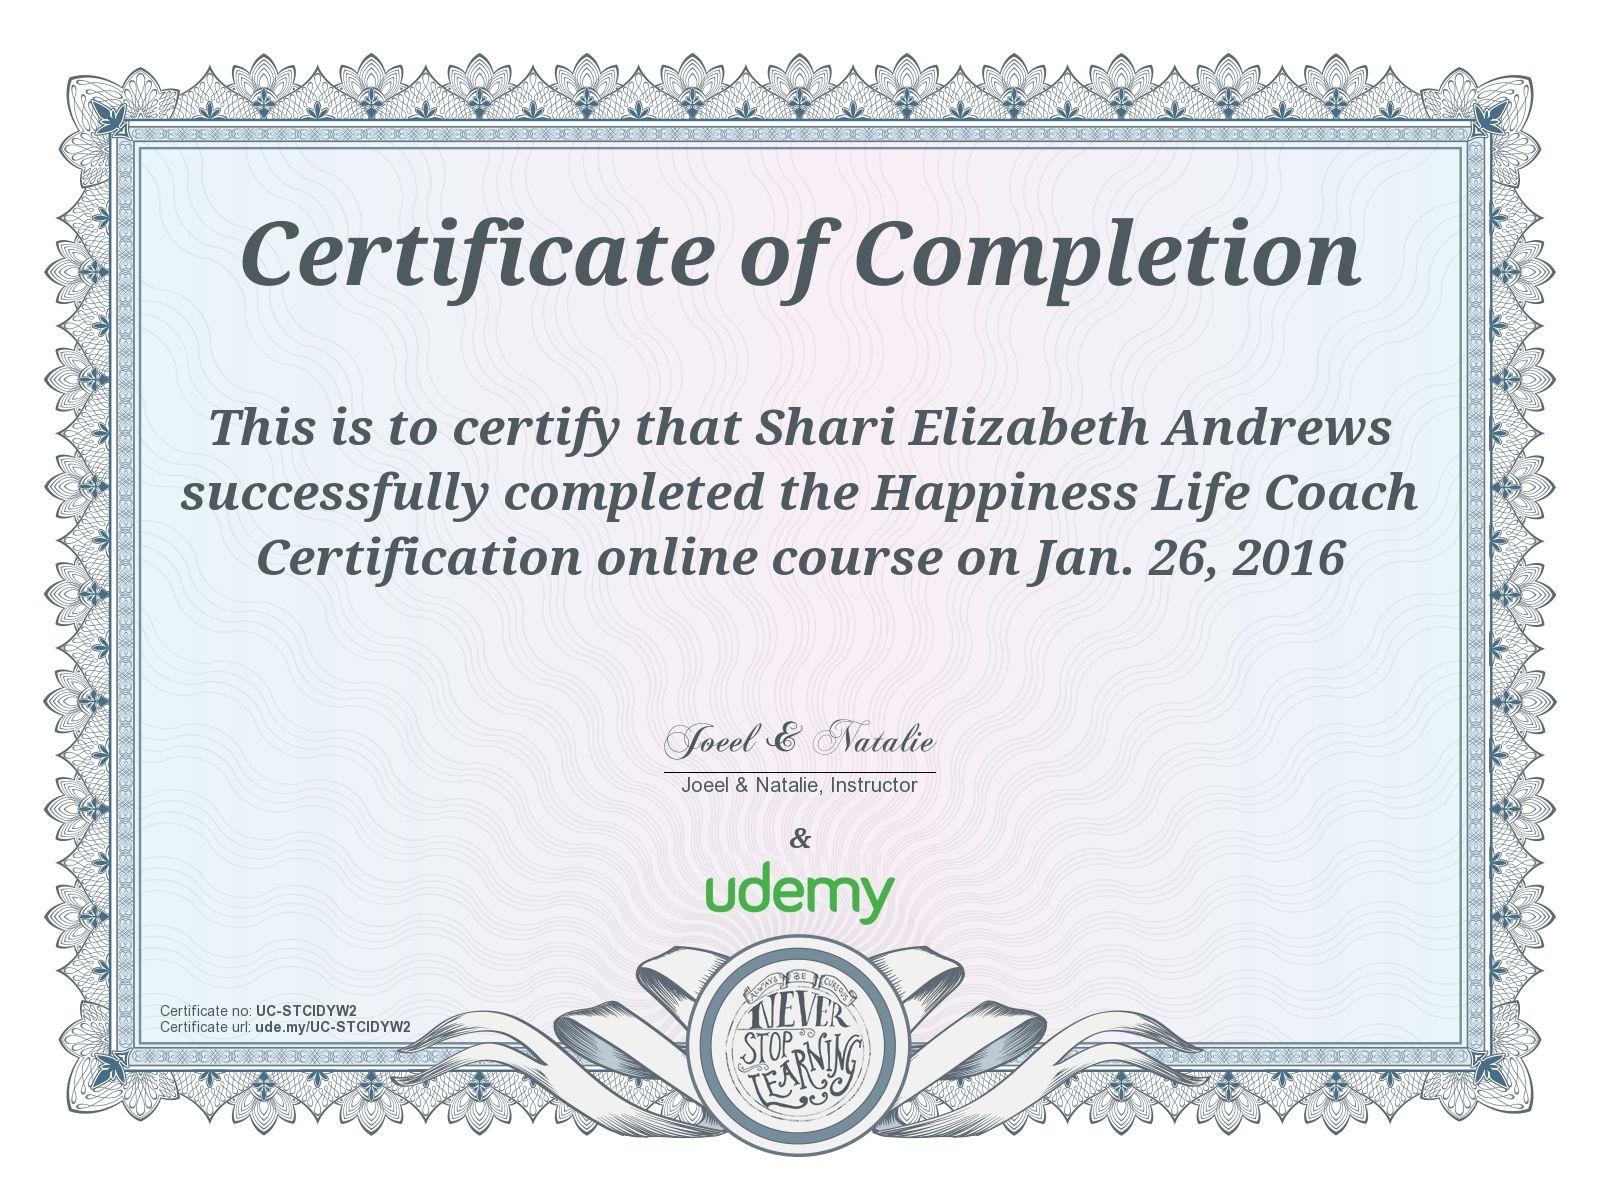 Best online courses udemy certificates ive received best online courses udemy xflitez Choice Image